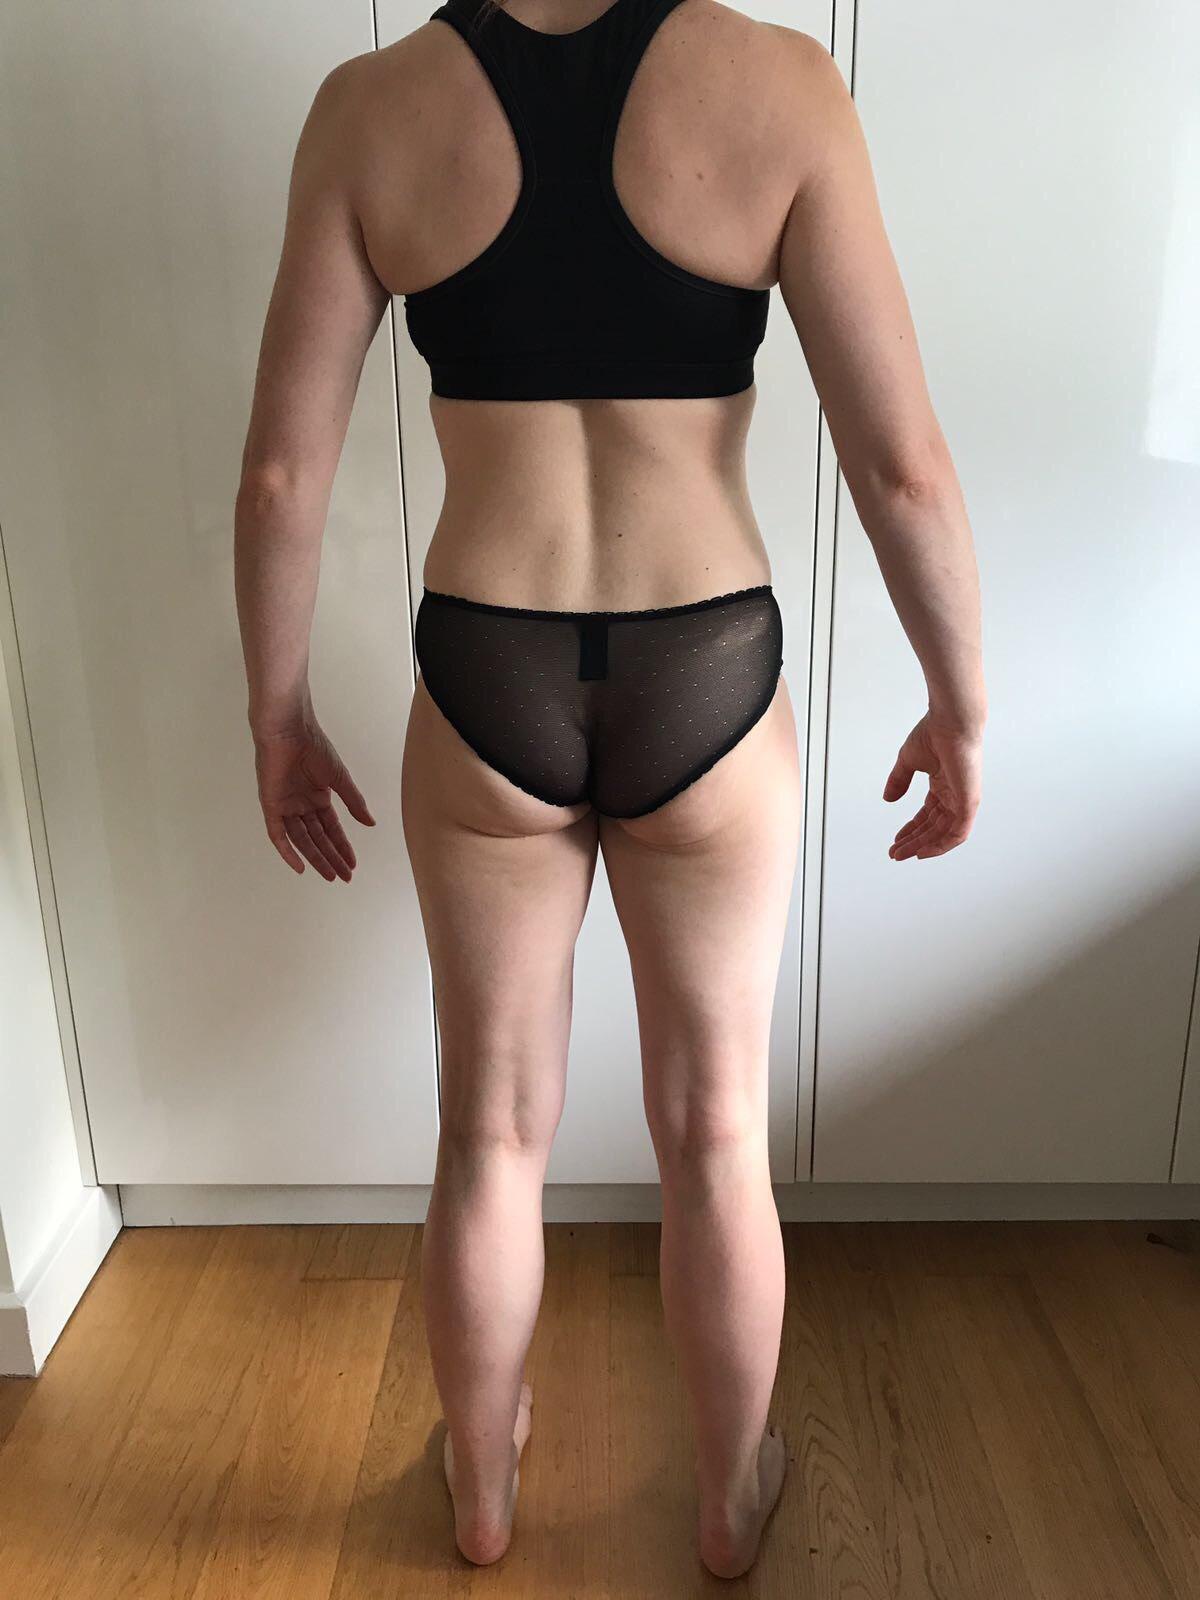 Running In Glass Shoes Bikini Fitness Goal Month 2 Progress Photo Back